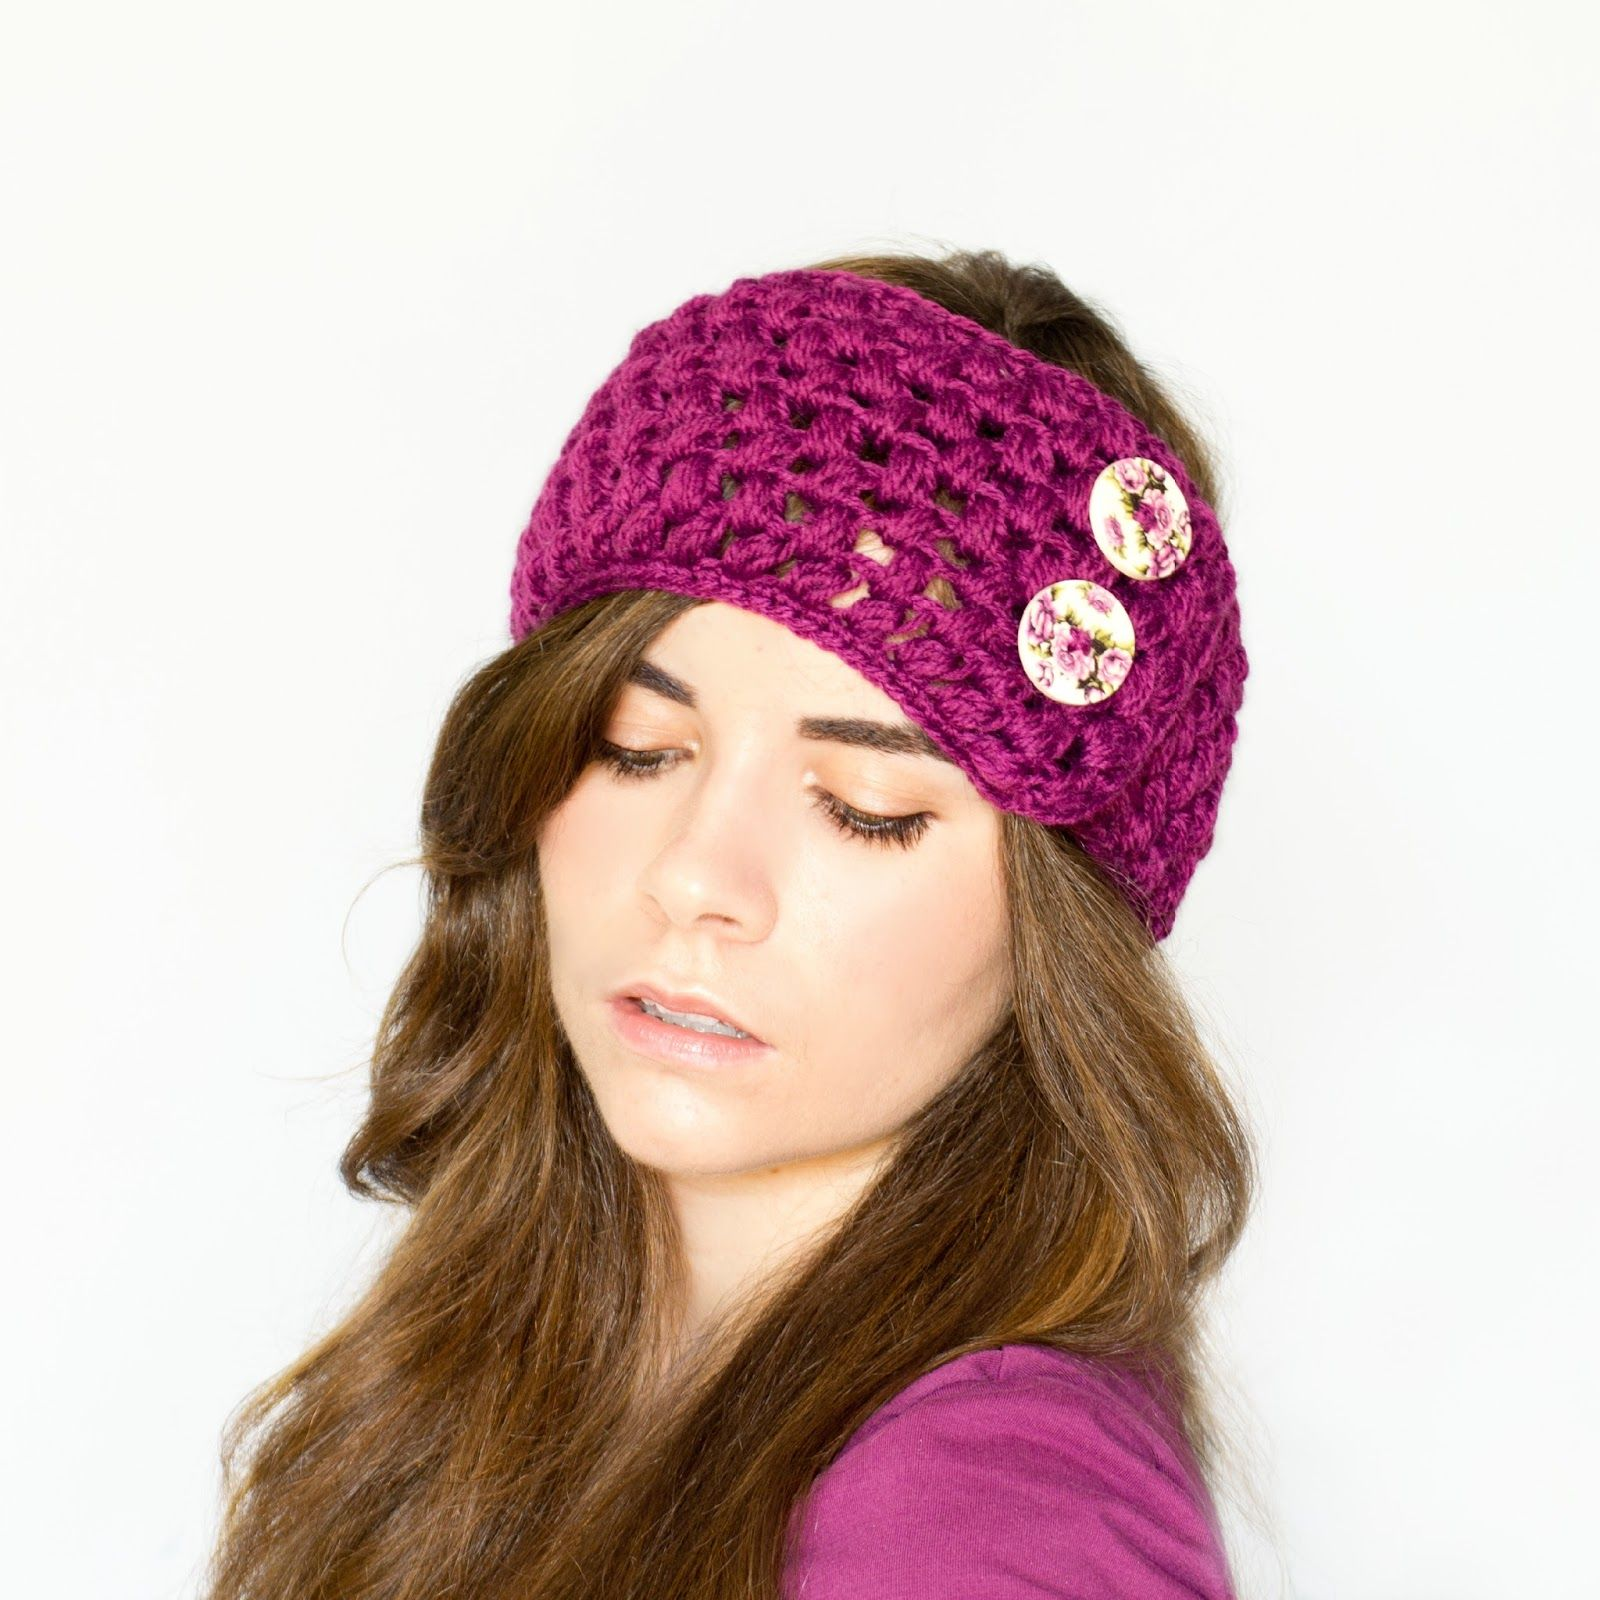 Puff Stitch Ear Warmer Crochet Pattern   Hopeful honey, Stitch and ...